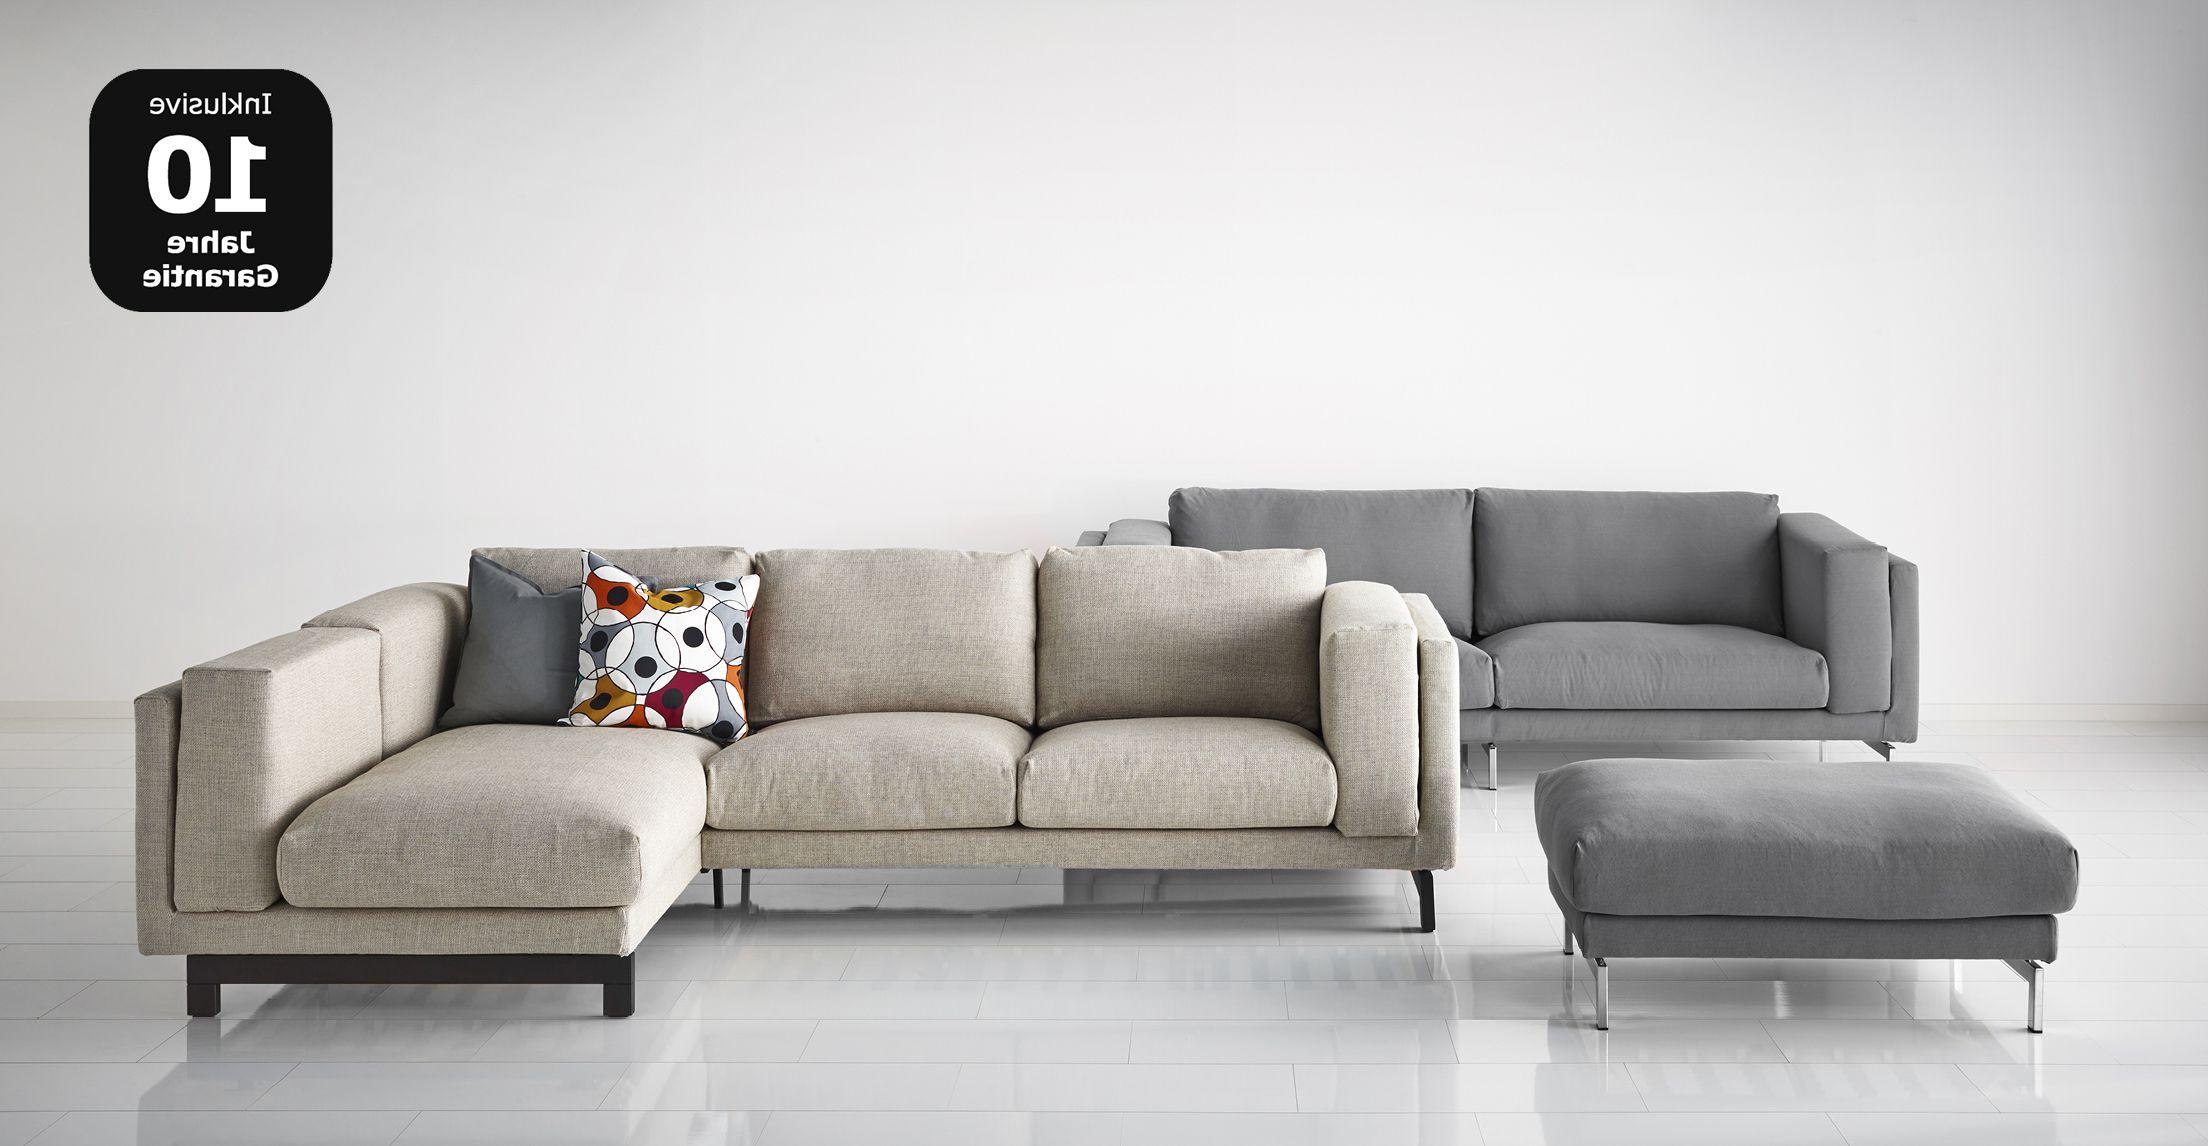 Sofa Nockeby E6d5 Ikea Nockeby sofa Pinterest sofa Ikea and Ikea sofa